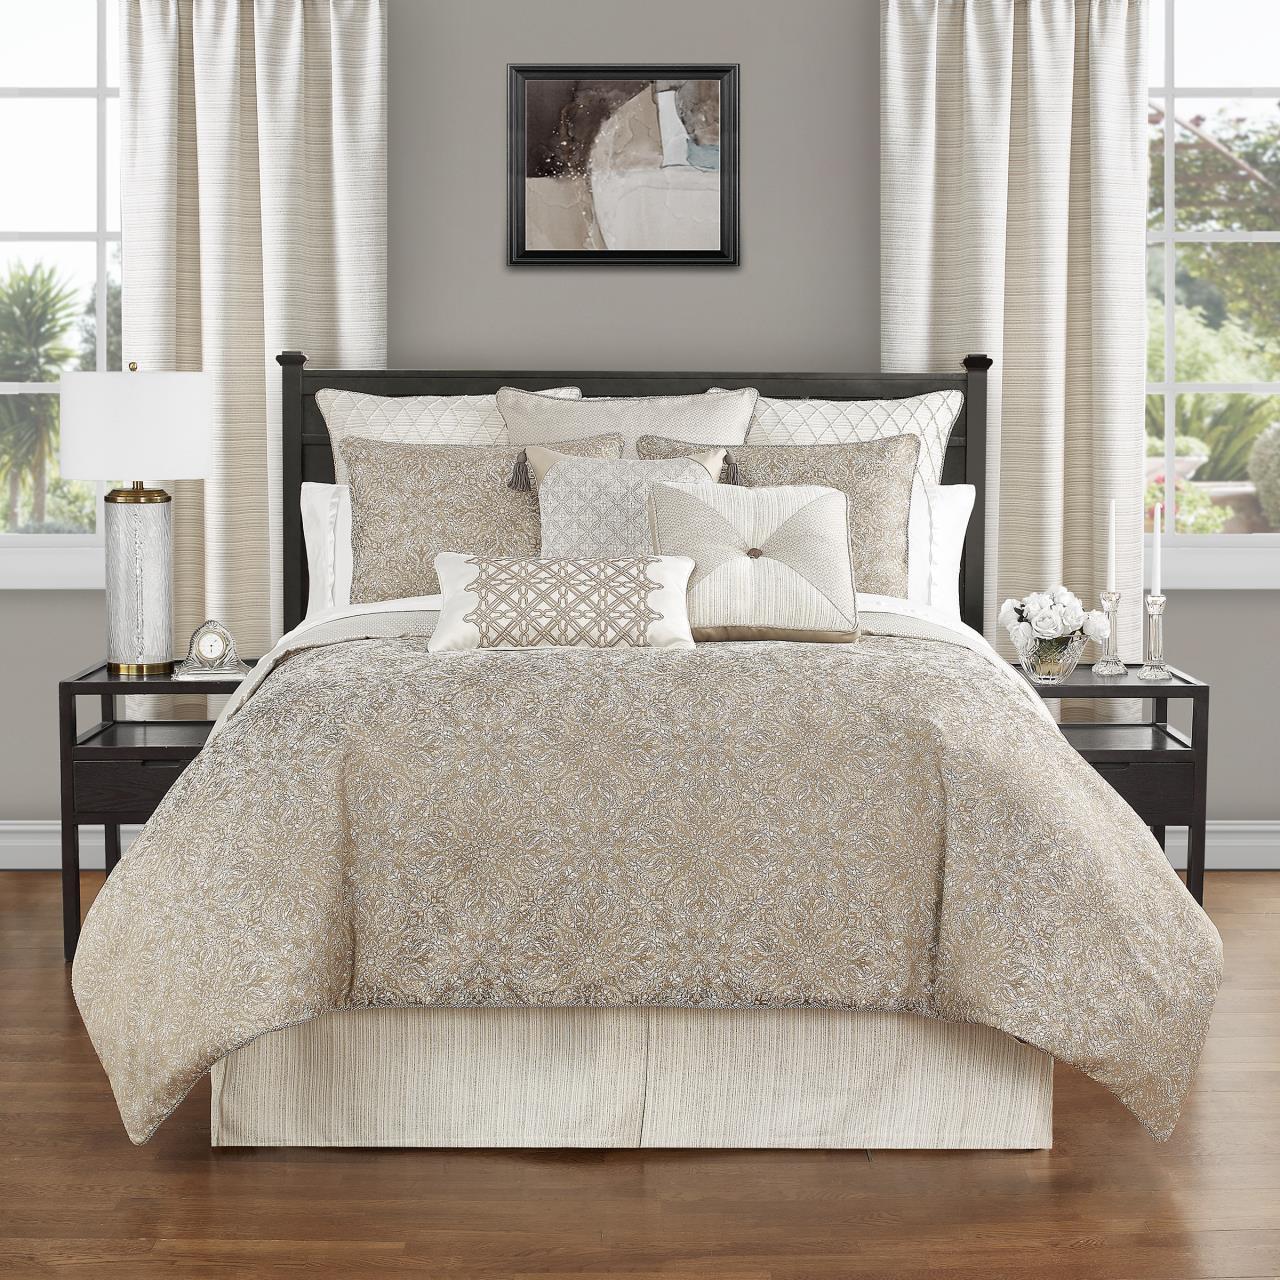 Spencer Mocha Comforter Collection -